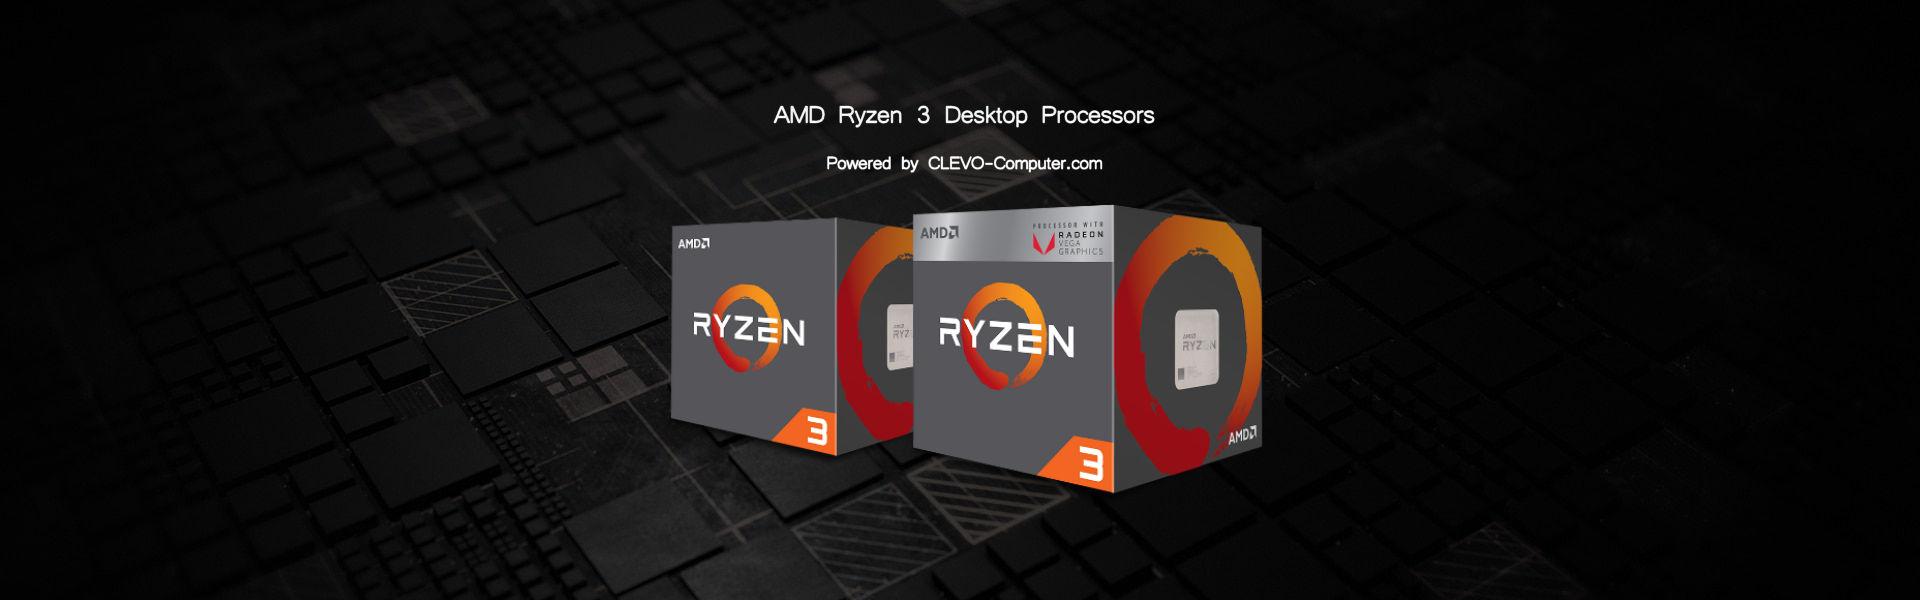 amd-ryzen-3-desktop-processors-powered-by-clevo-computer